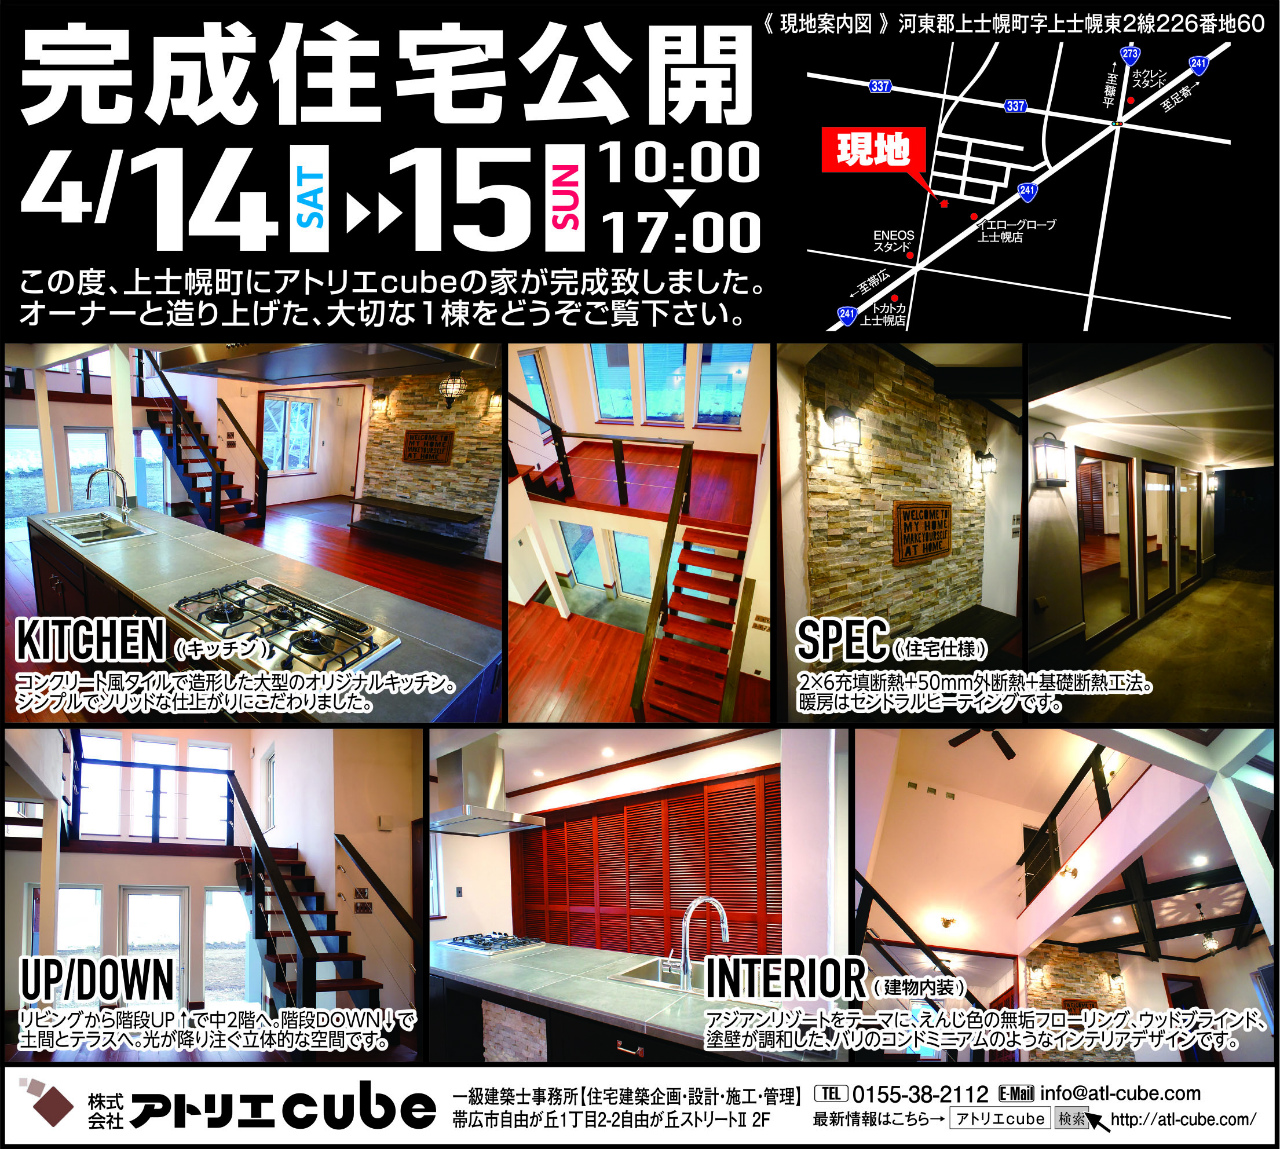 http://atl-cube.com/blog/images/s20180412.jpg